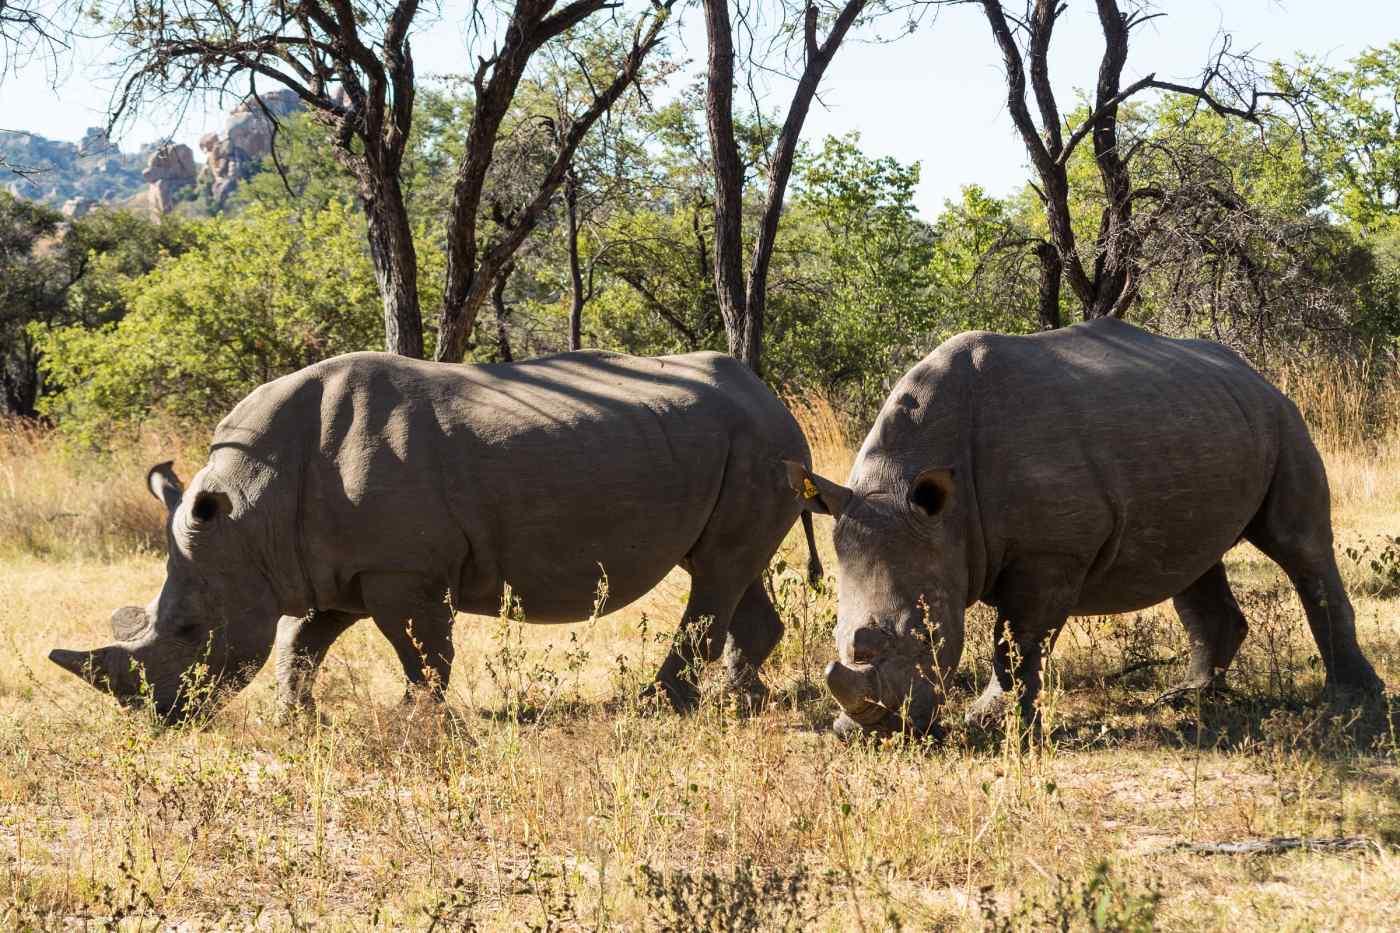 Matobo National Park, South Africa